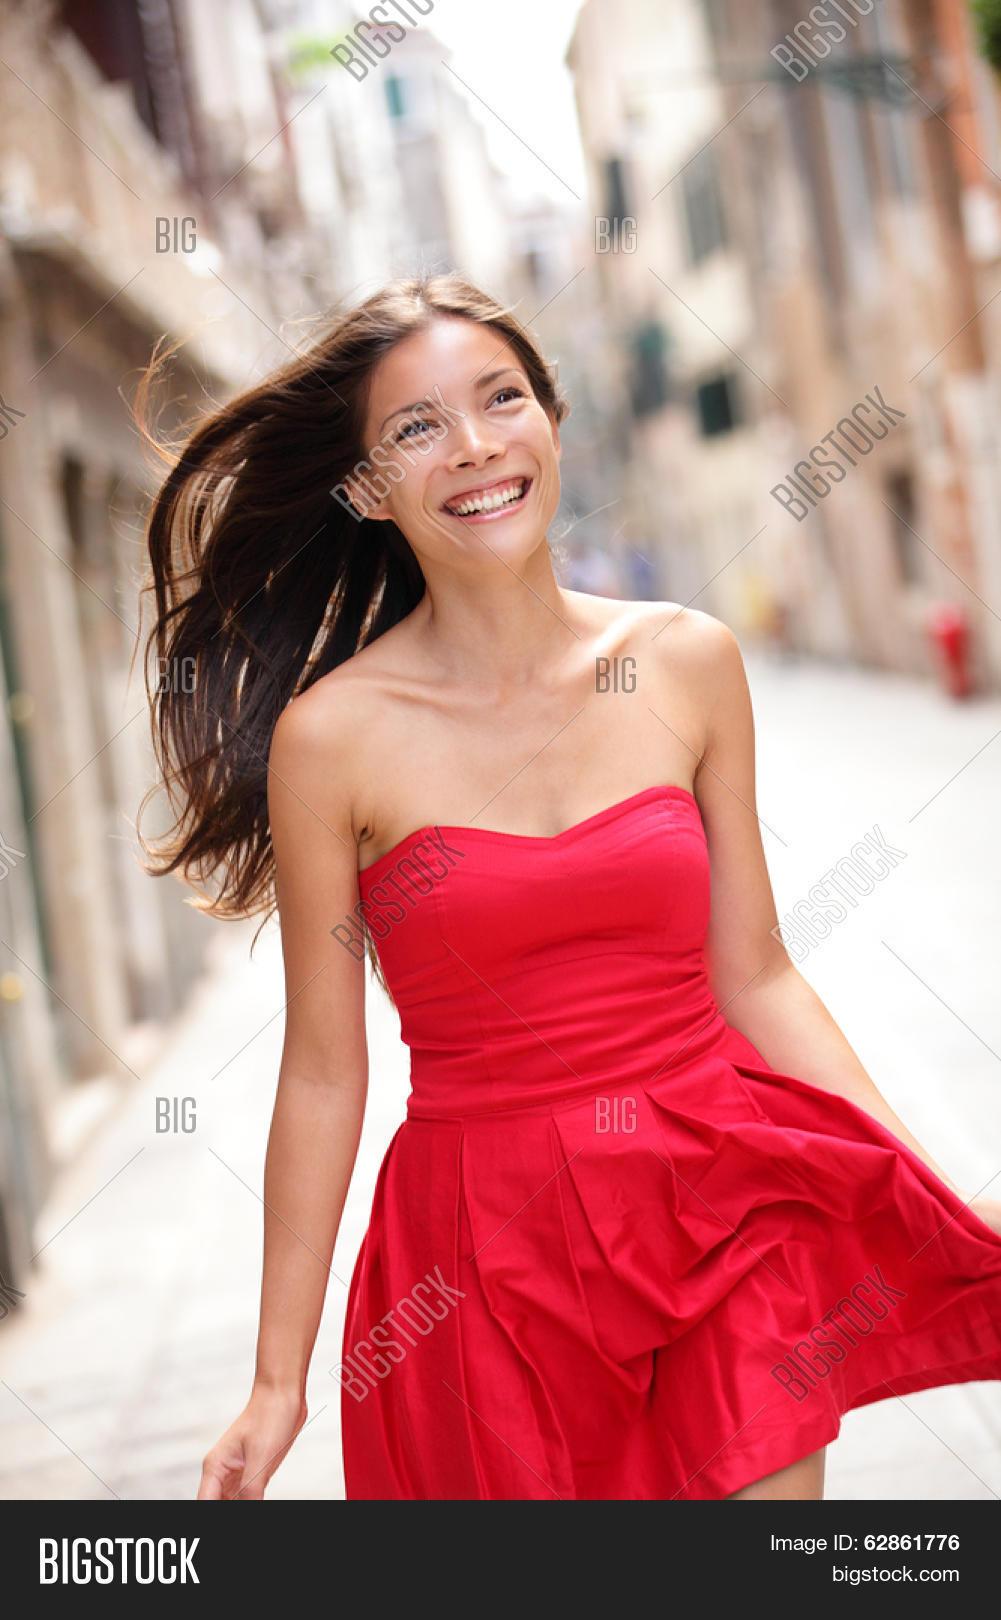 penn run single asian girls Kal penn was born and raised in montclair,  - run (2018)  seth wright  2016 better off single brice 2016 new girl (tv series).